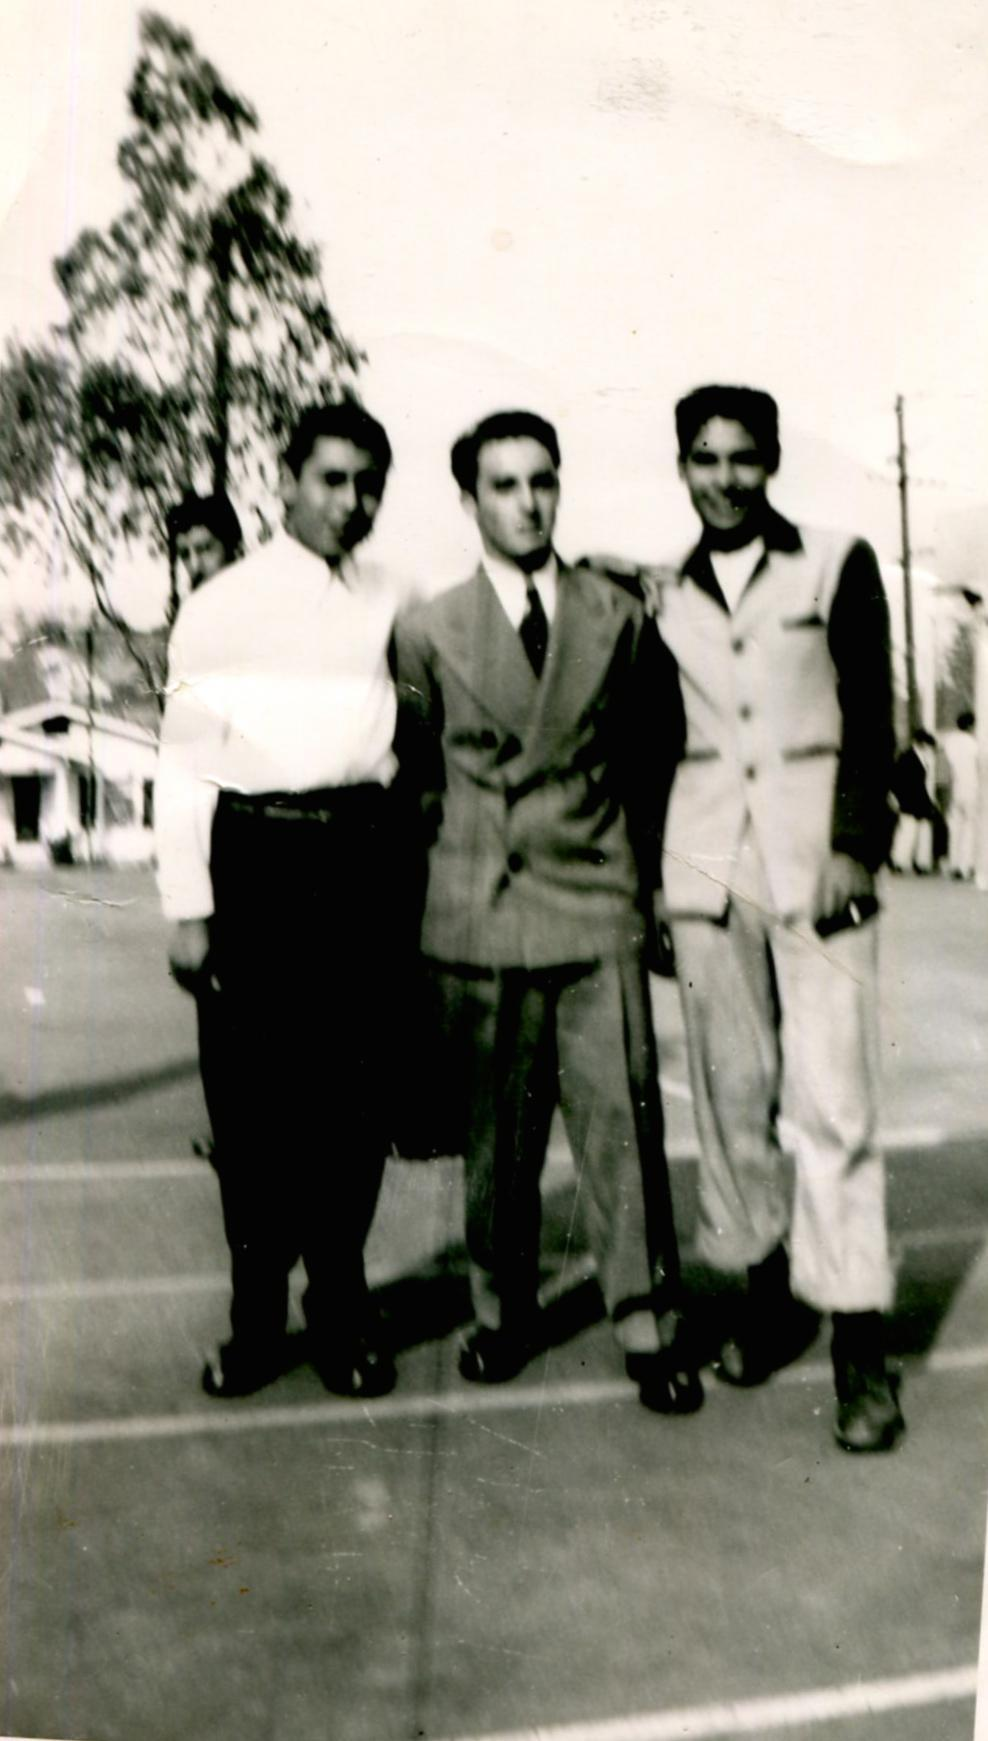 1947 Belvedere J.H. Senors 'AVE' and Manuel Fernandez